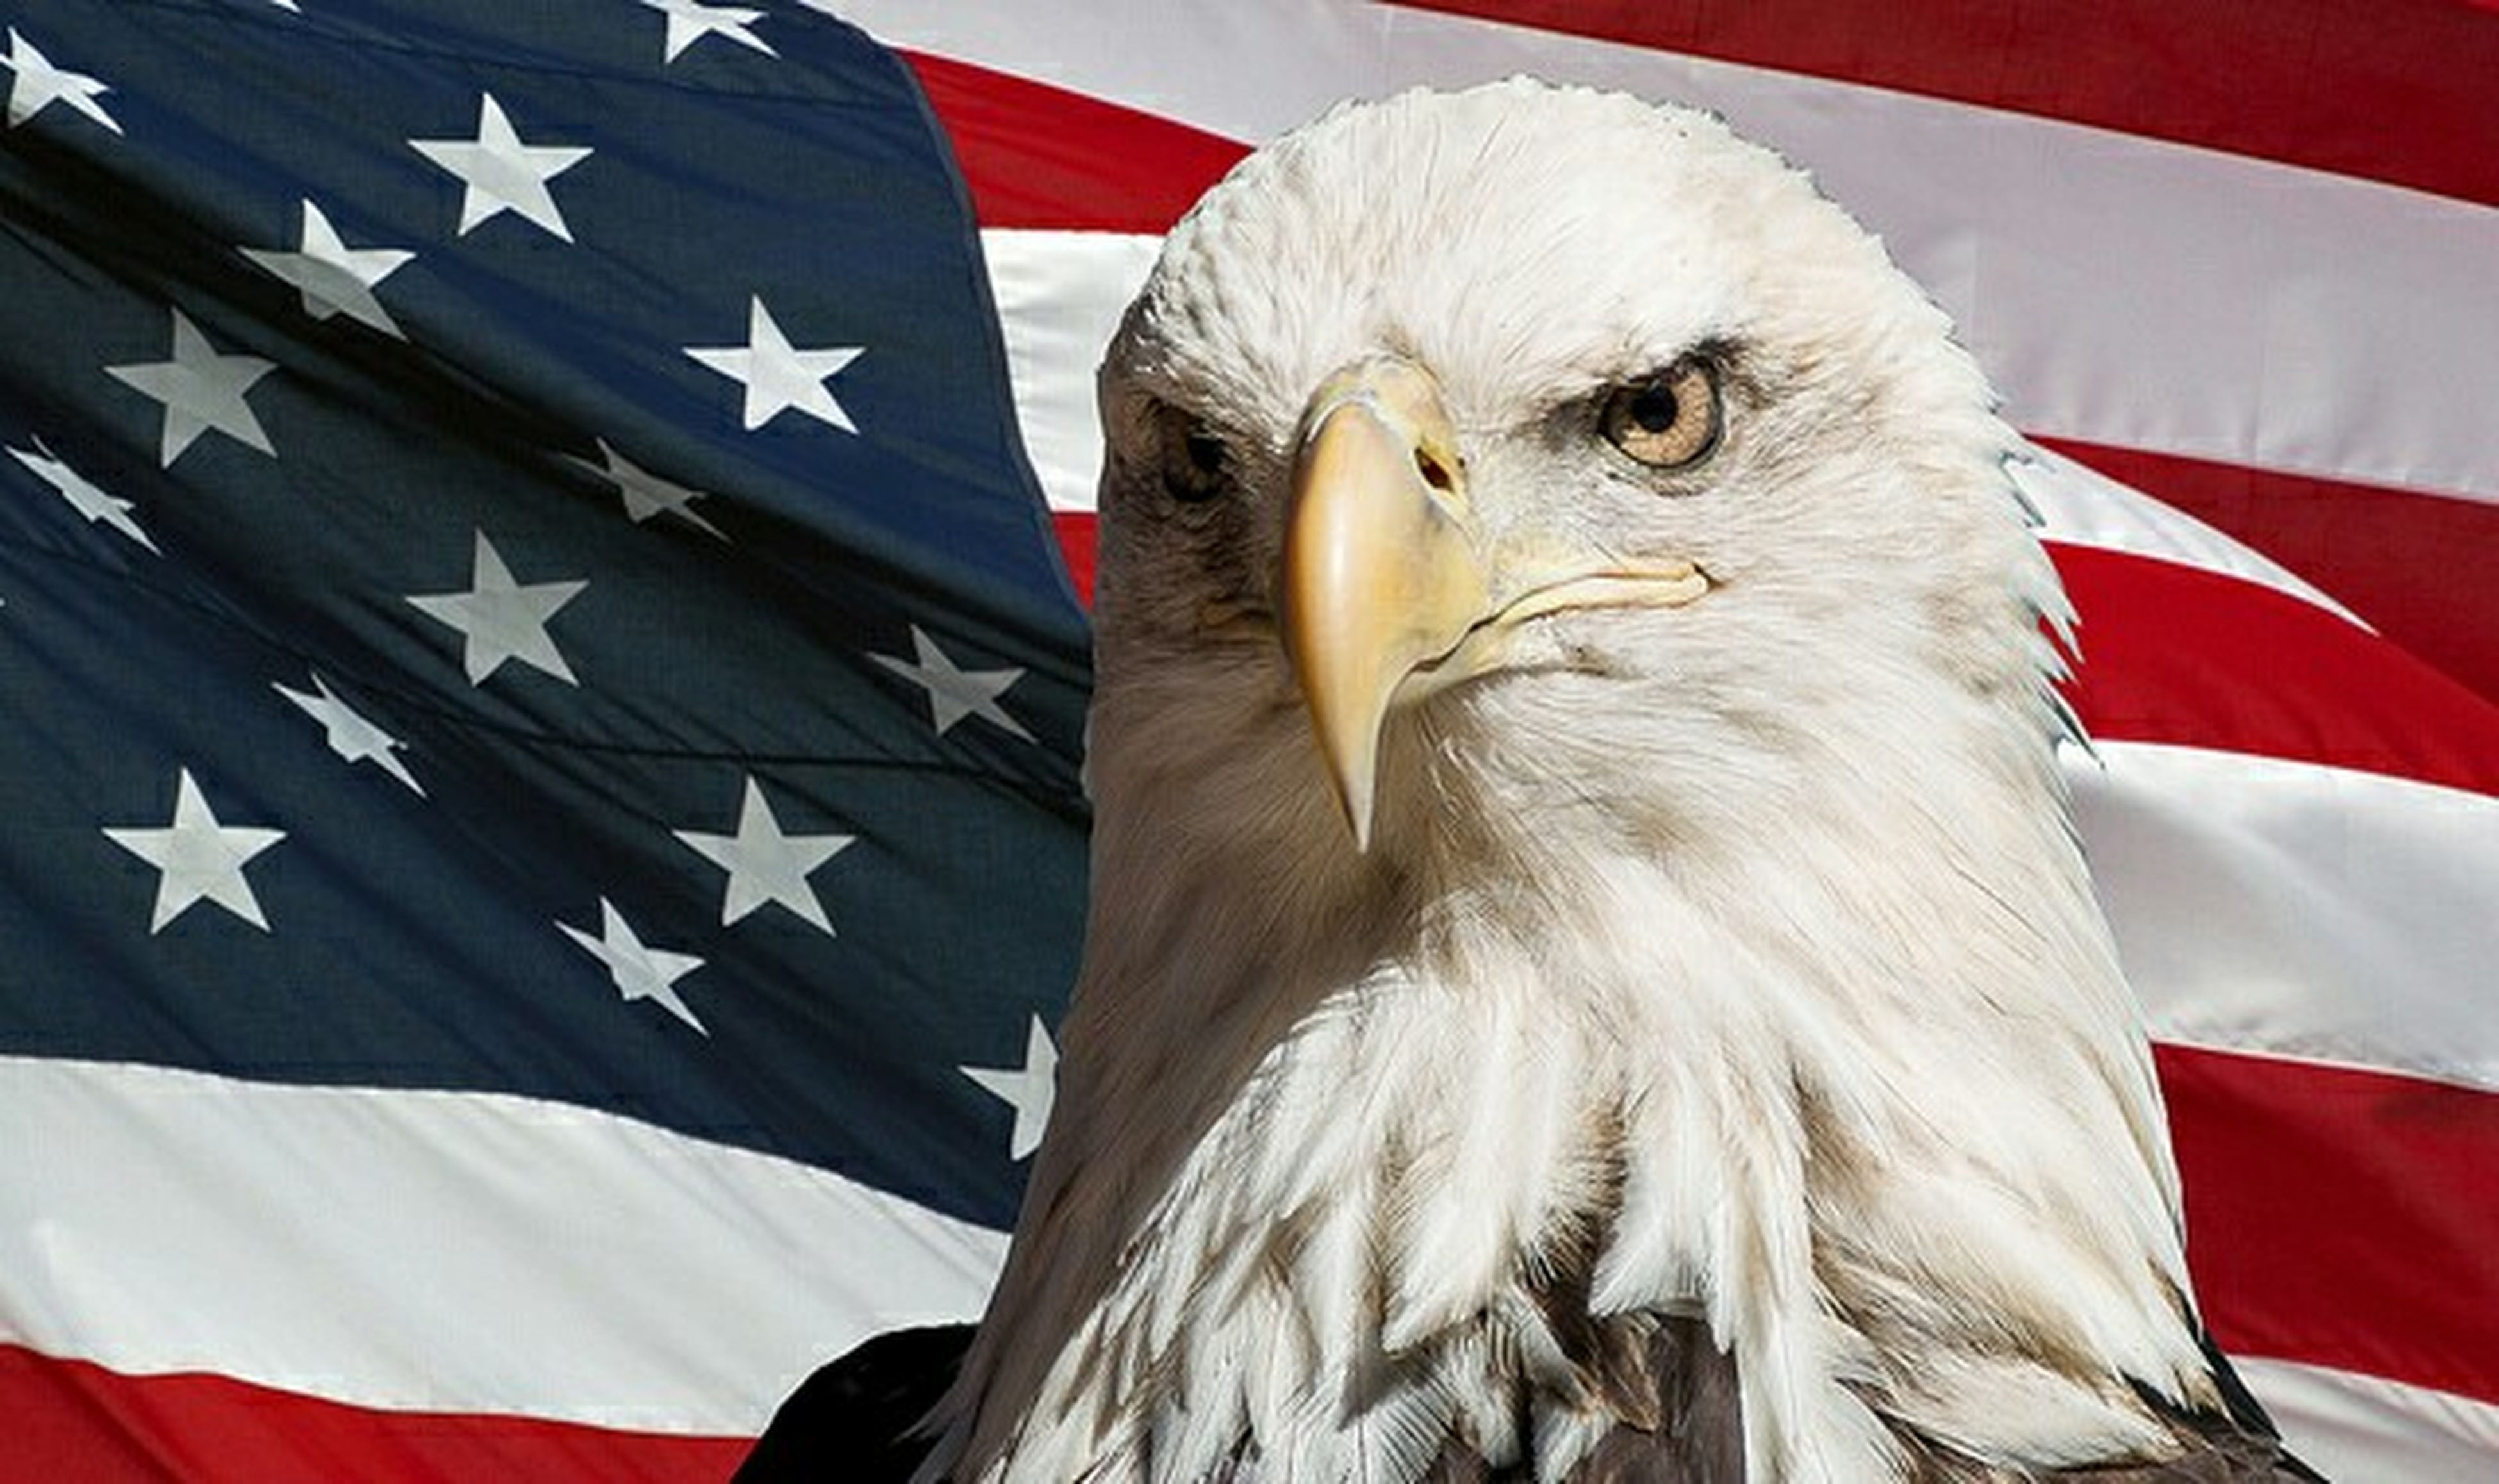 patriotism, flag, white color, beak, bald eagle, close-up, blue, portrait, bird, eagle - bird, red, no people, day, bird of prey